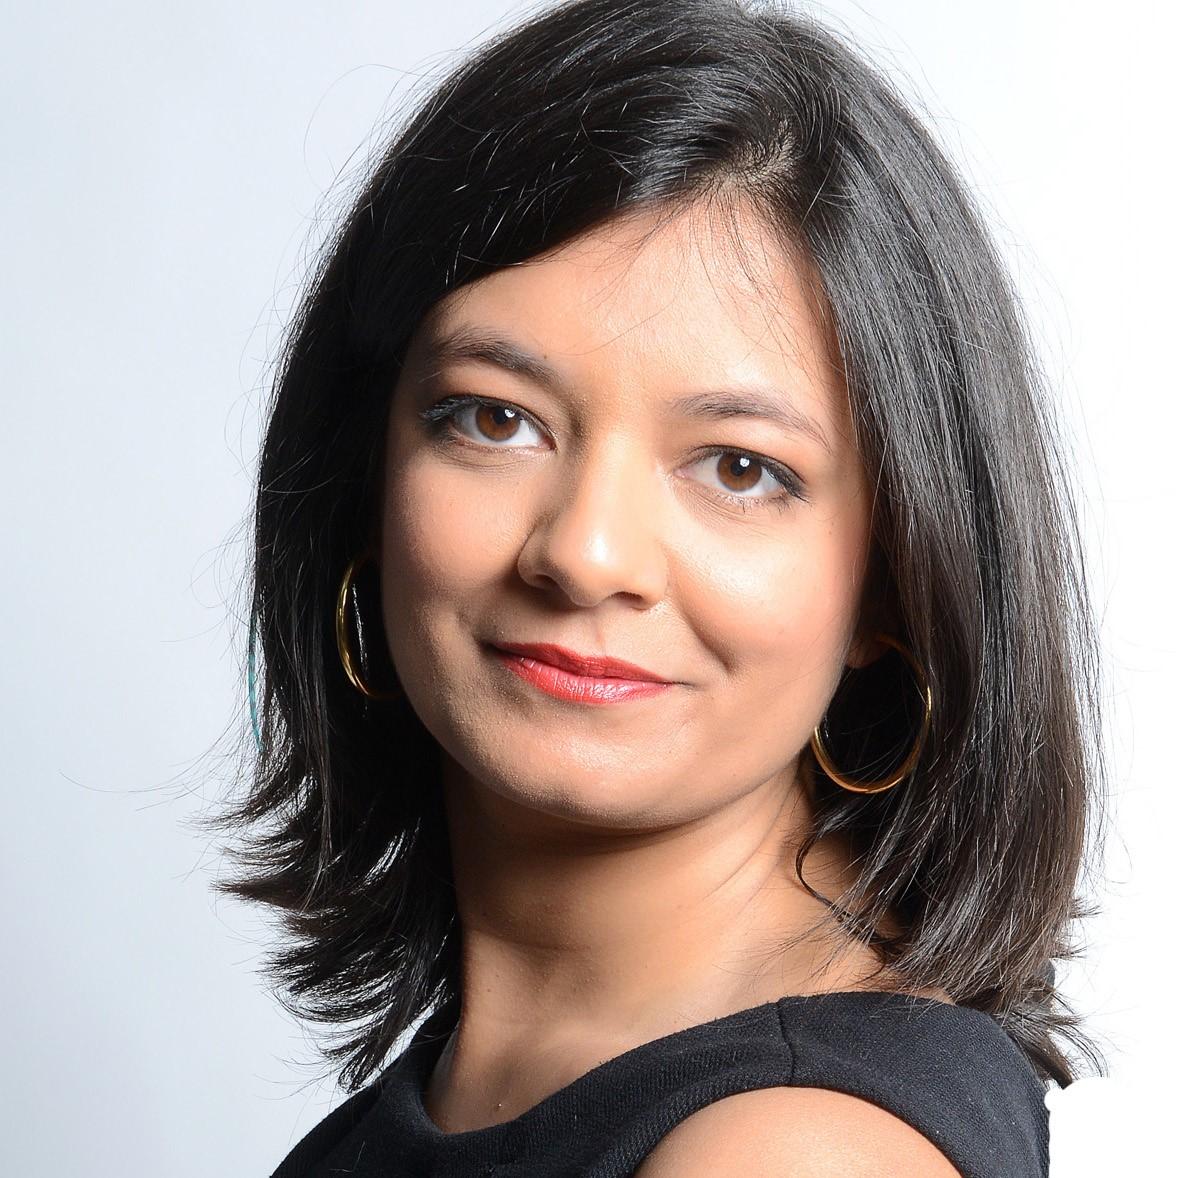 Amena Akbaraly